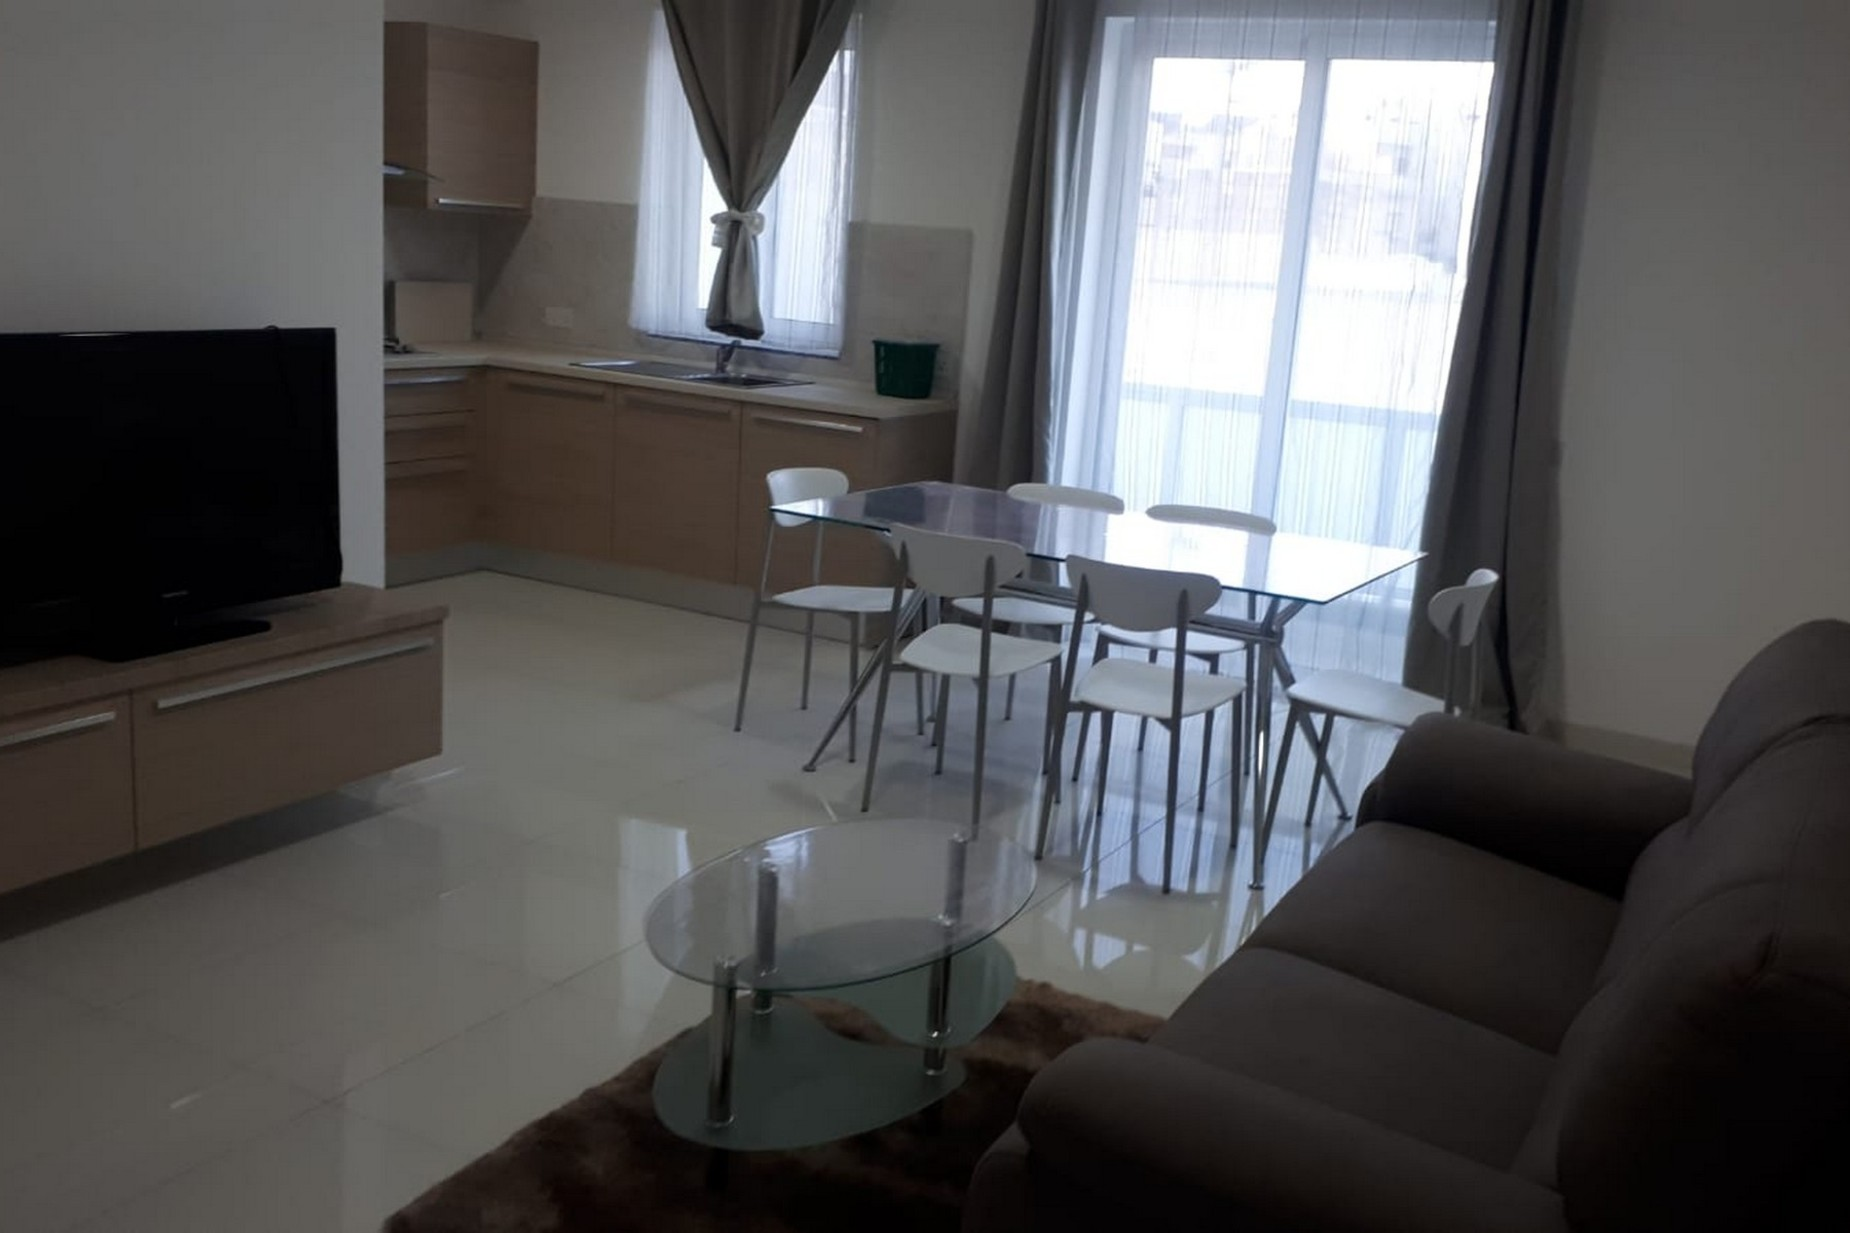 3 bed Apartment For Rent in Rabat, Rabat - thumb 3